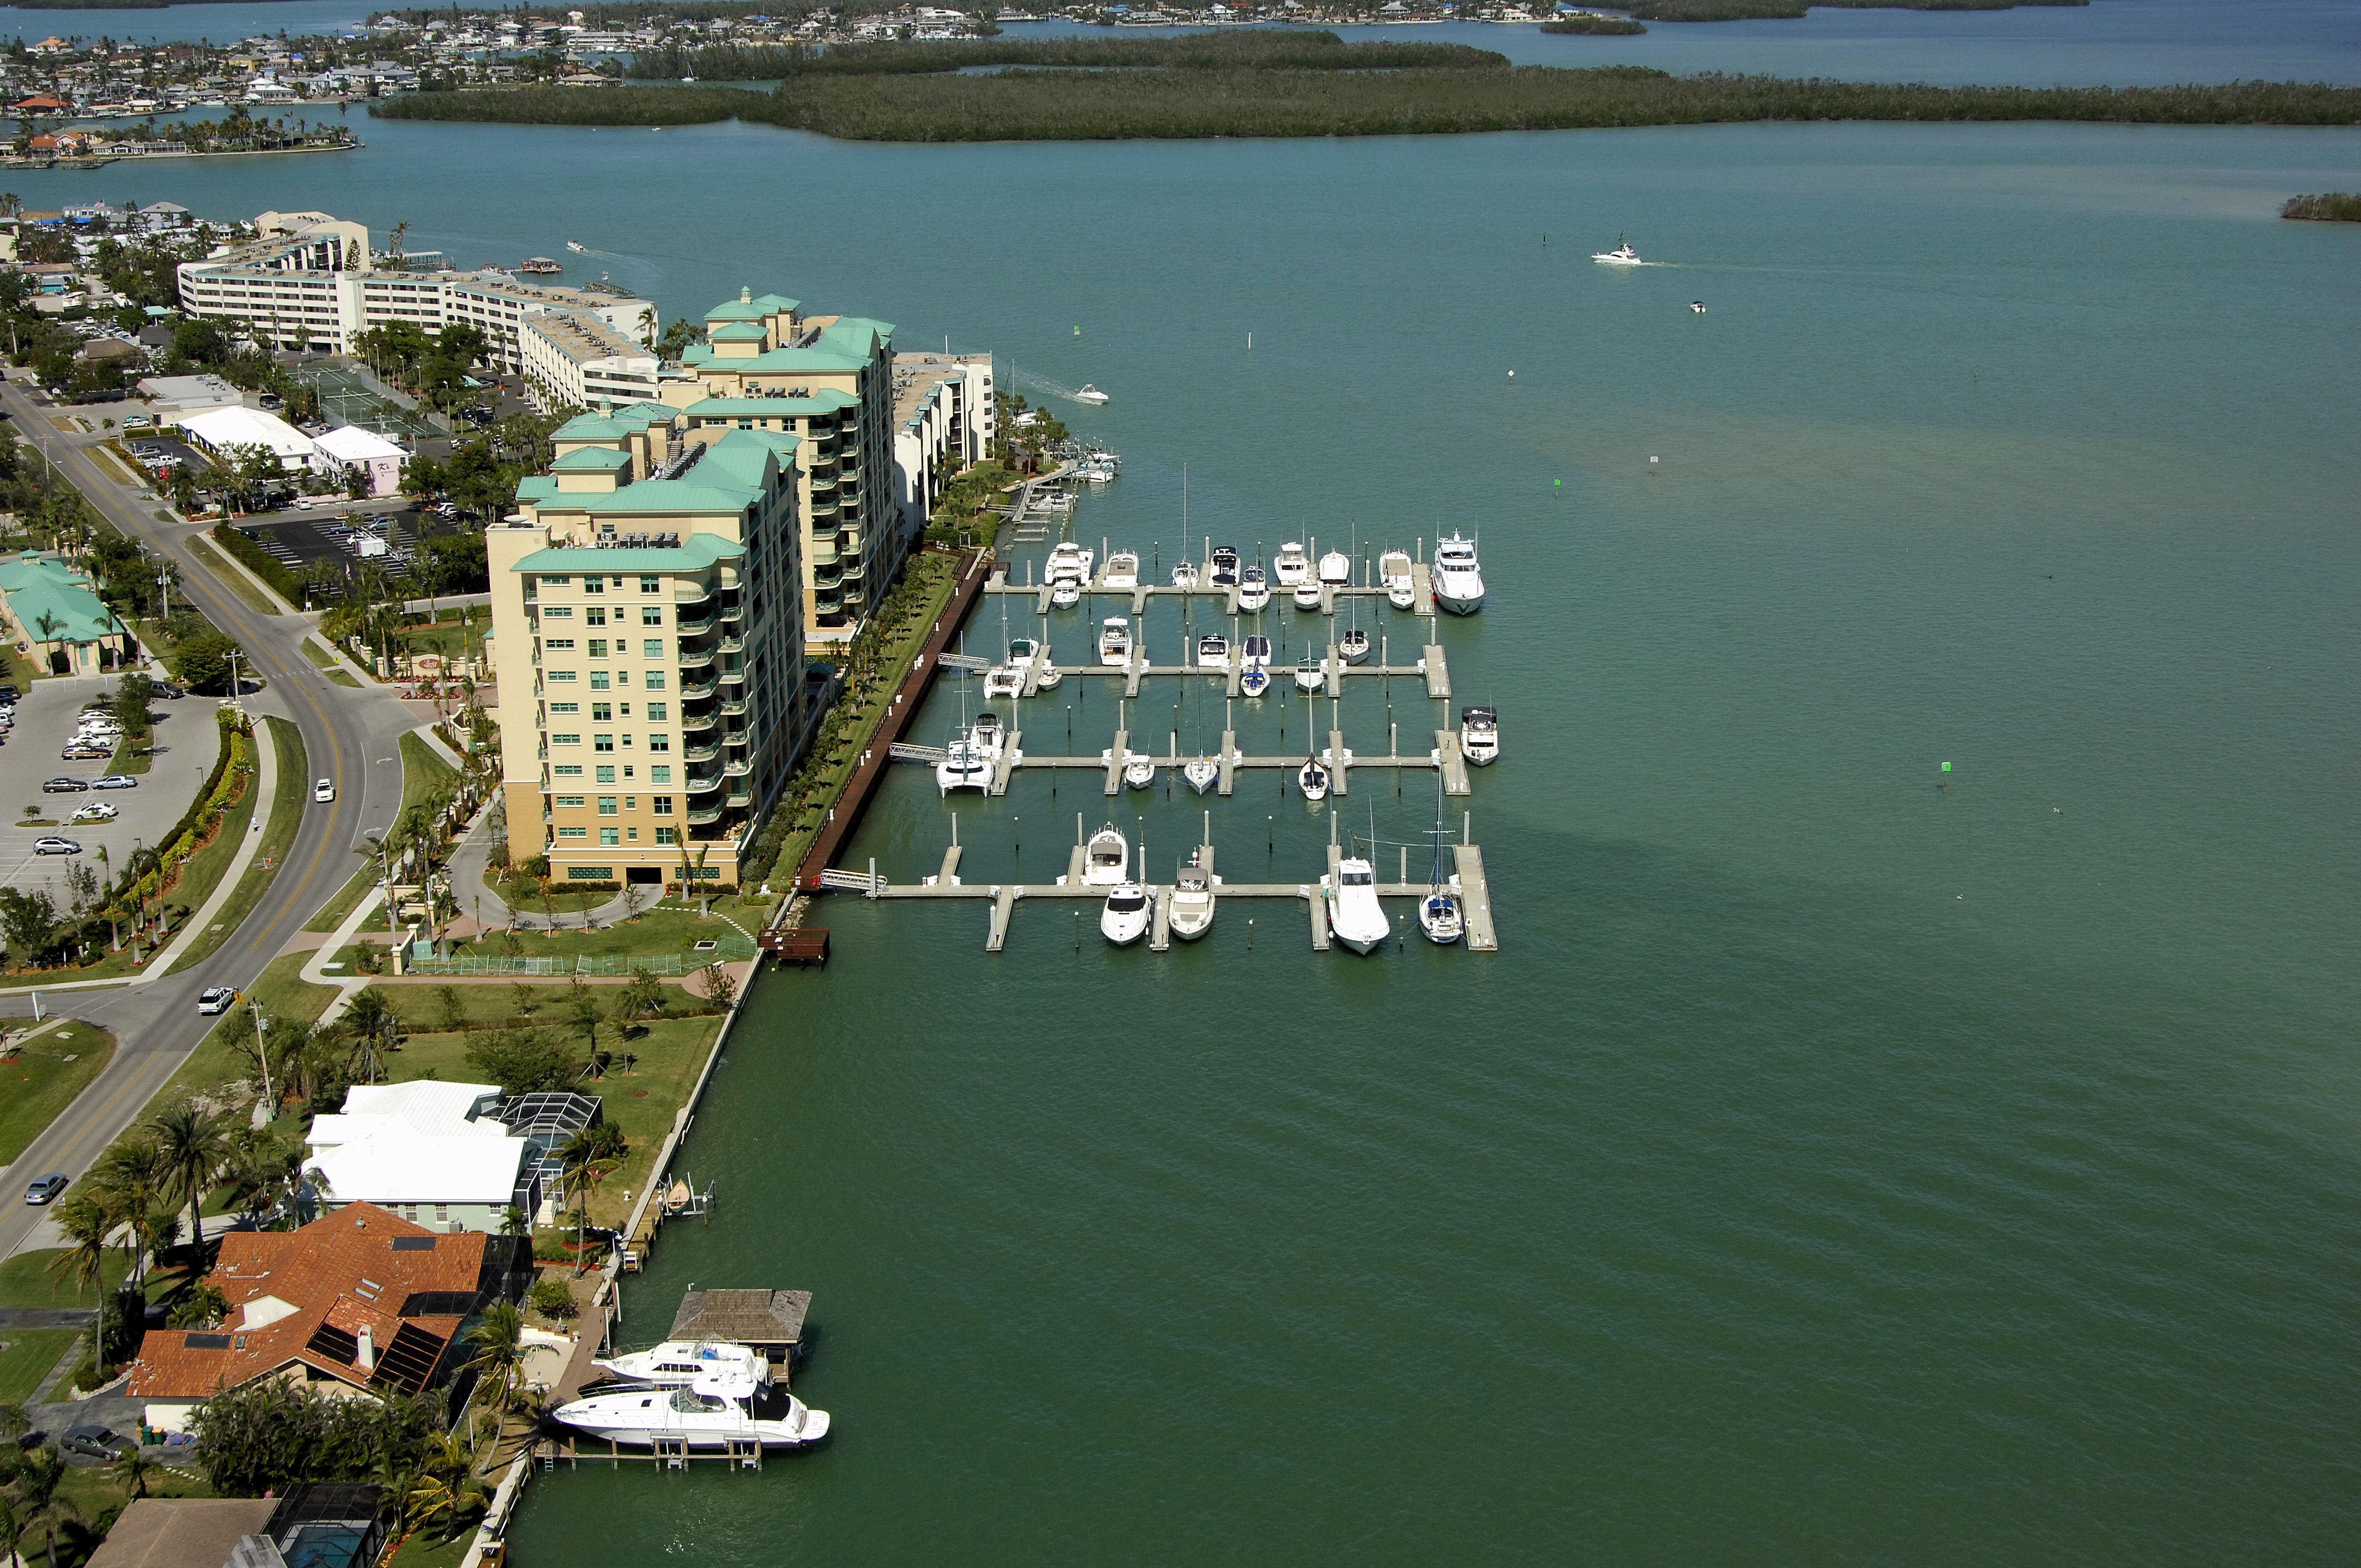 Fullsize Of City Of Marco Island